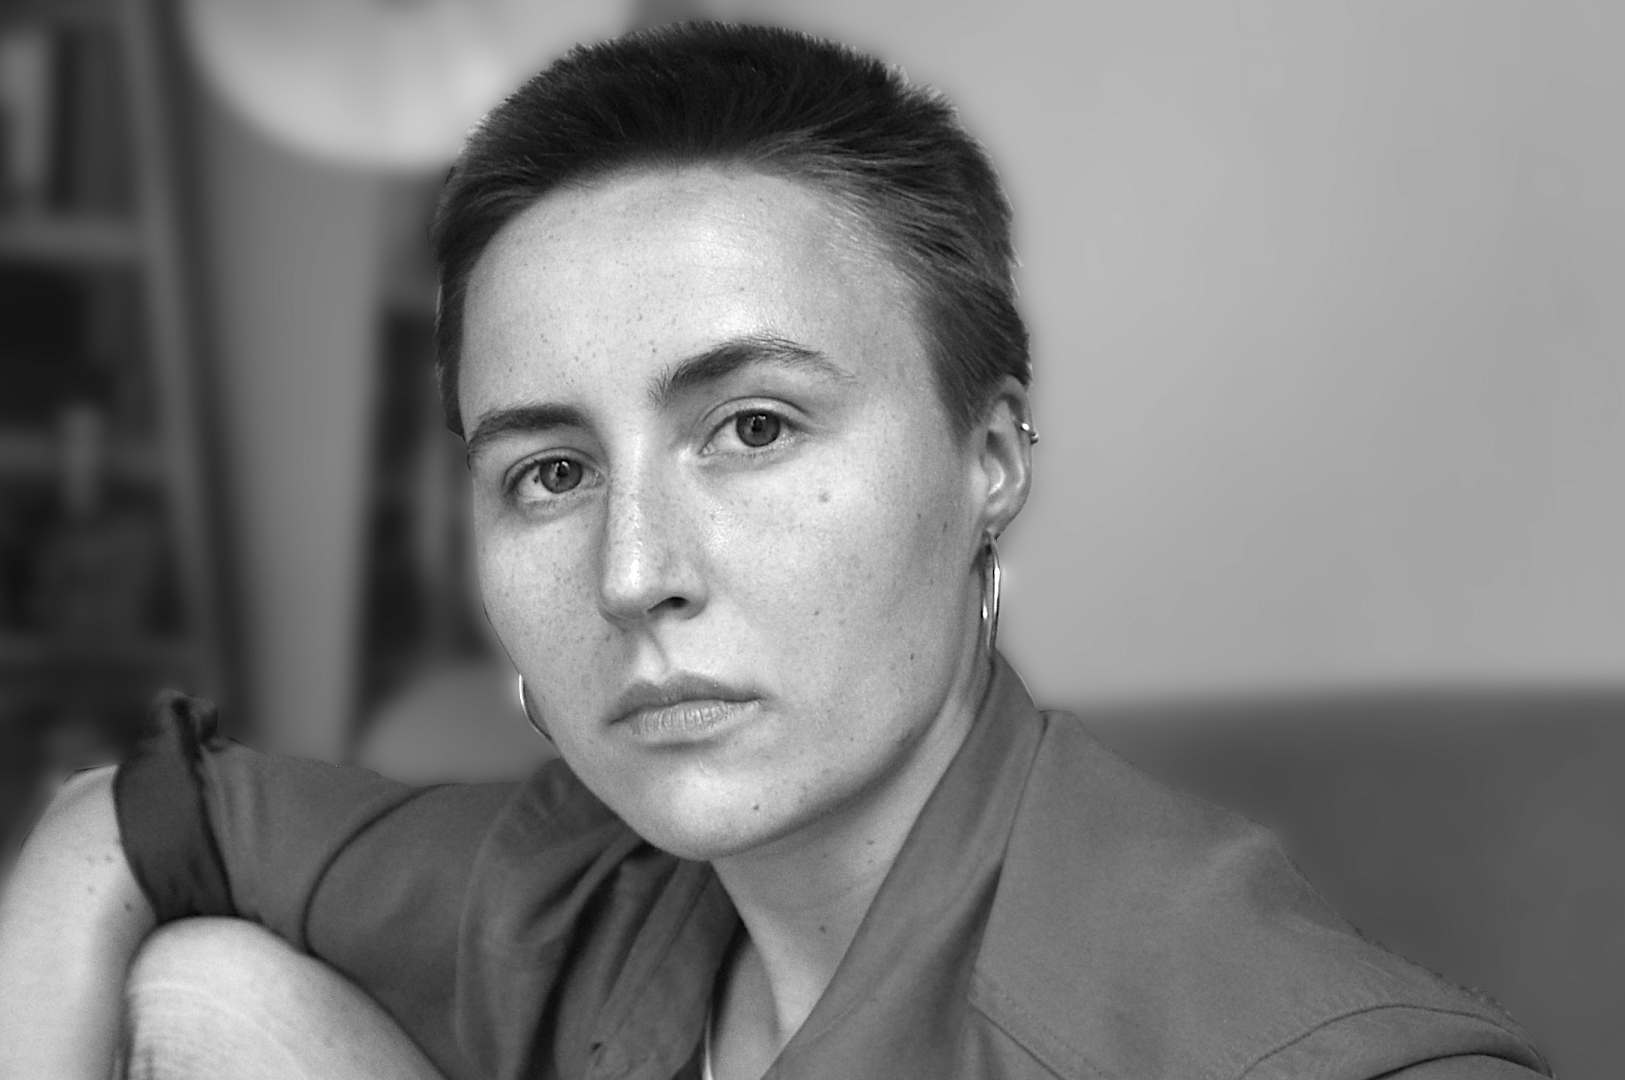 Sarah Ströbele